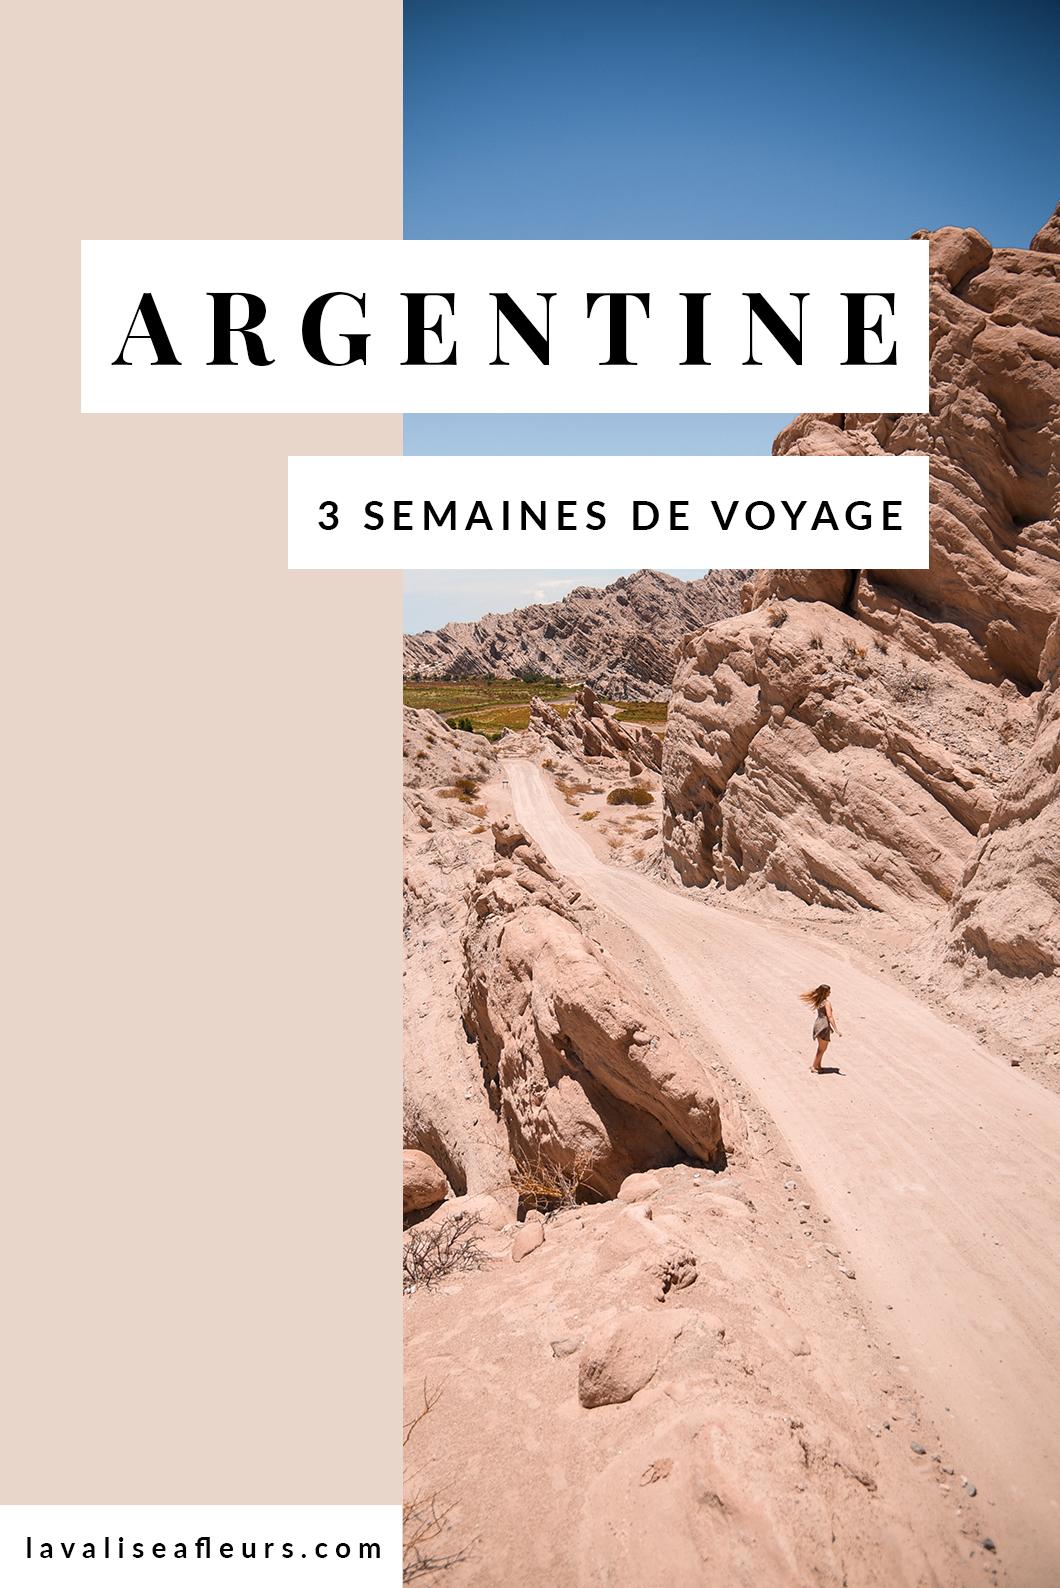 Argentine, 3 semaines de voyage